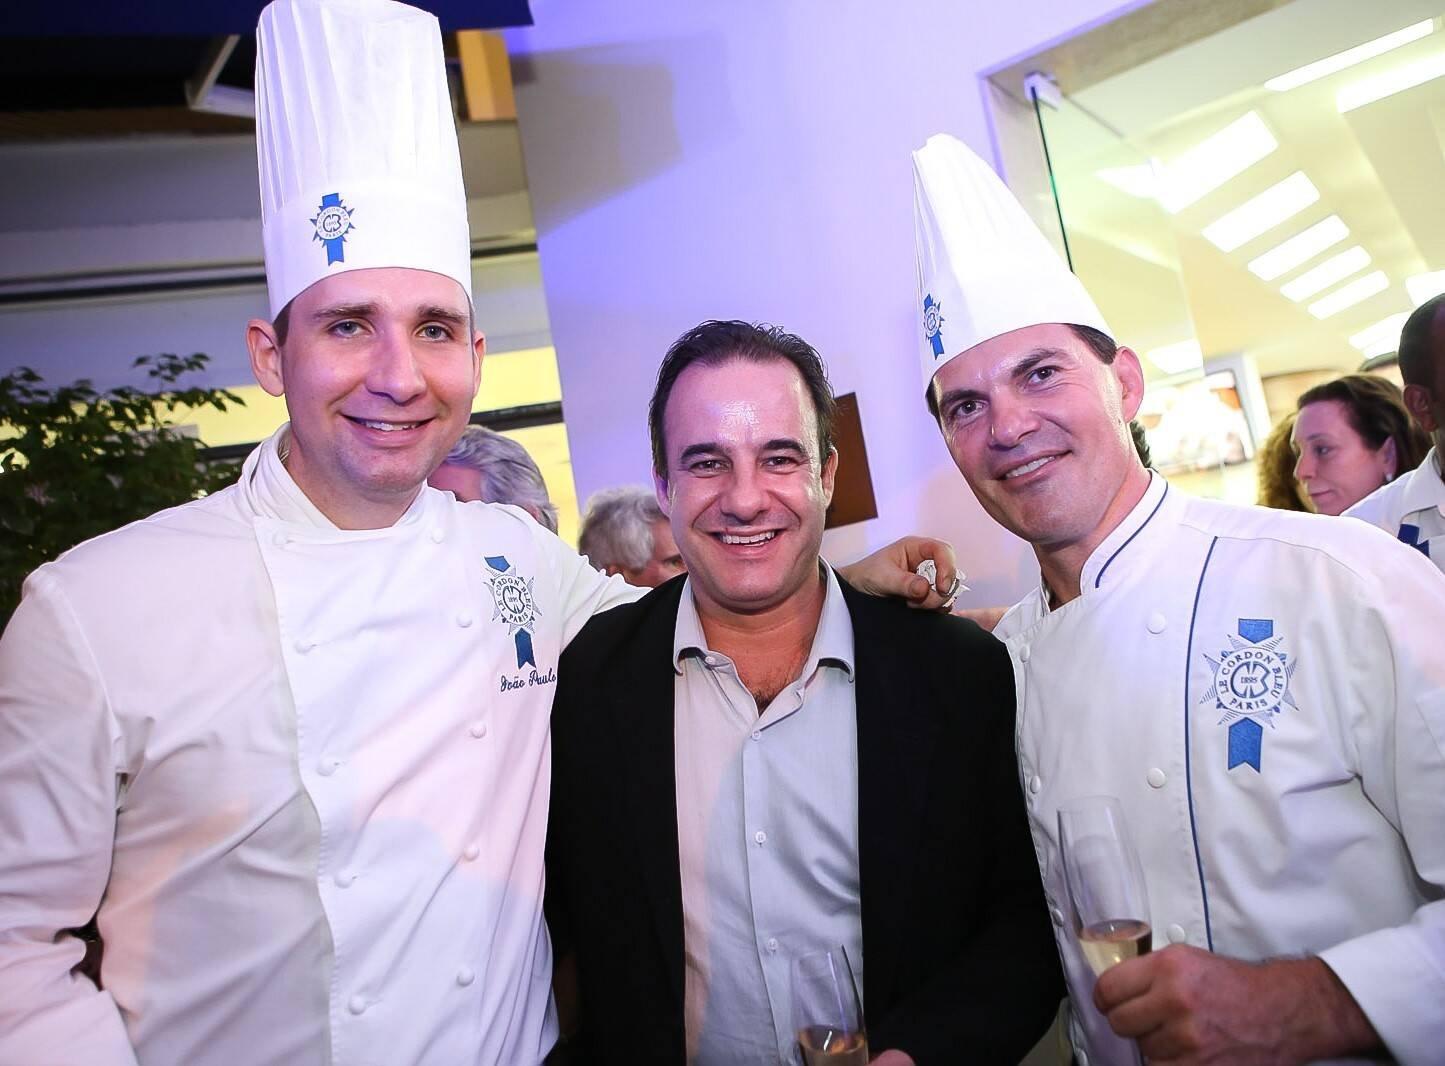 João Paulo Frankenfeld, Frederic Monier e Nicolas de La Cruz  /Foto: Gianne Carvalho